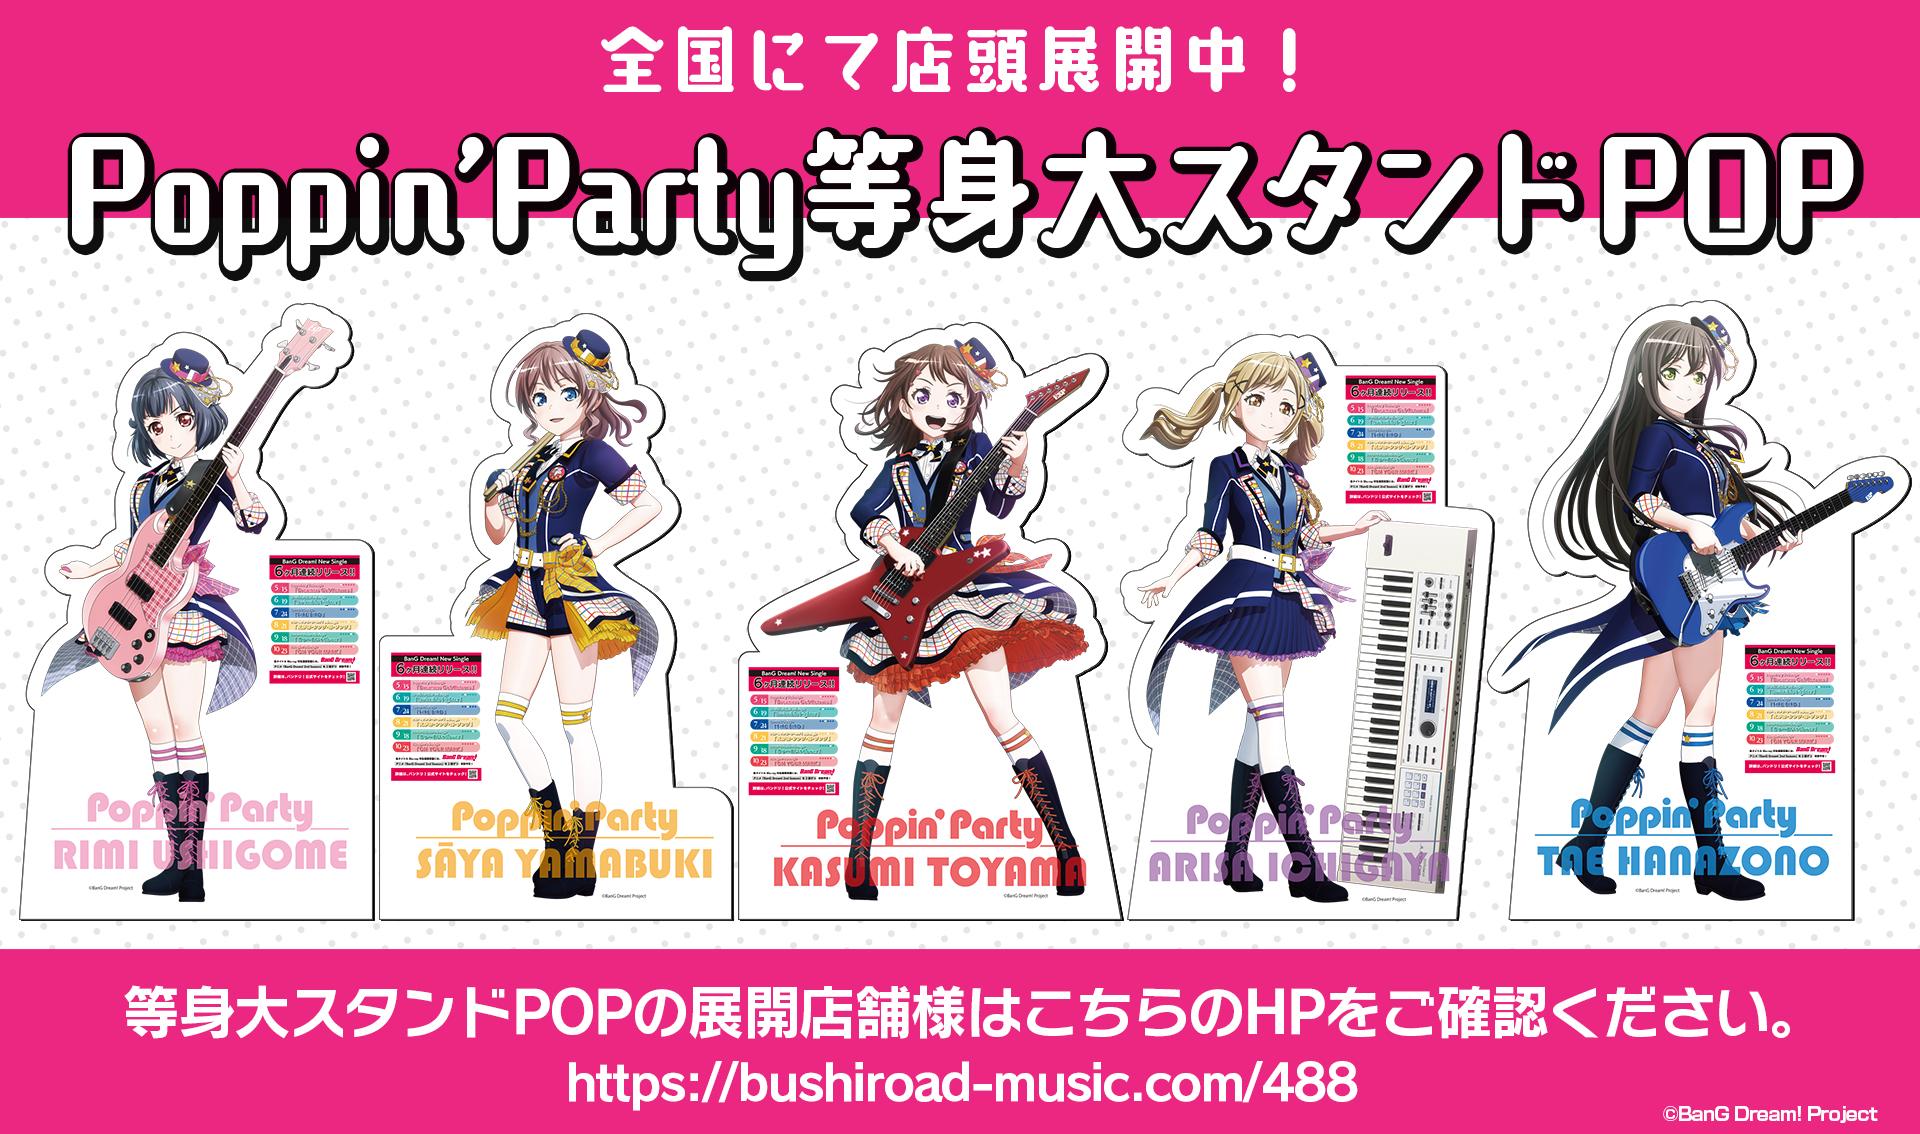 BanG Dream!(バンドリ!)Poppin'Party14th Single「Dreamers Go!/ Returns」発売記念 Poppin'Party等身大スタンドPOPツイートキャンペーン